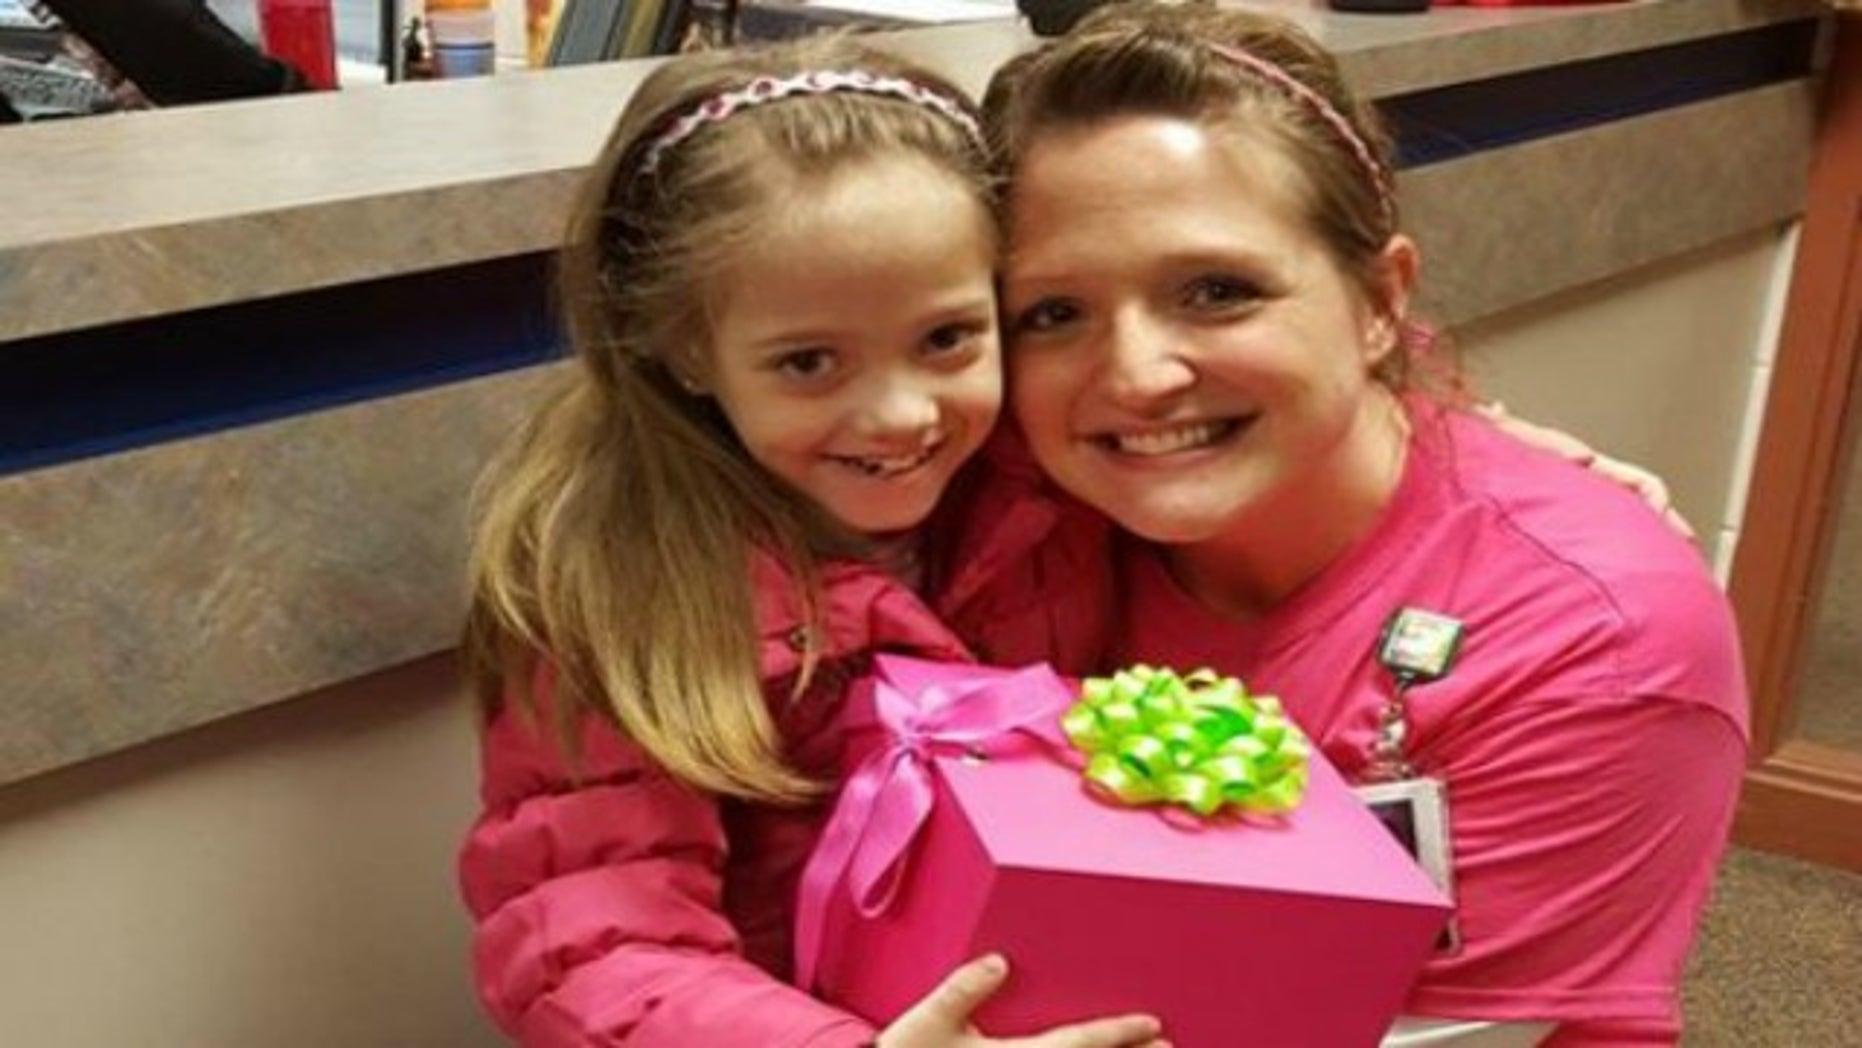 Jodi Schmidt is donating a kidney to her student, Natasha Fuller.